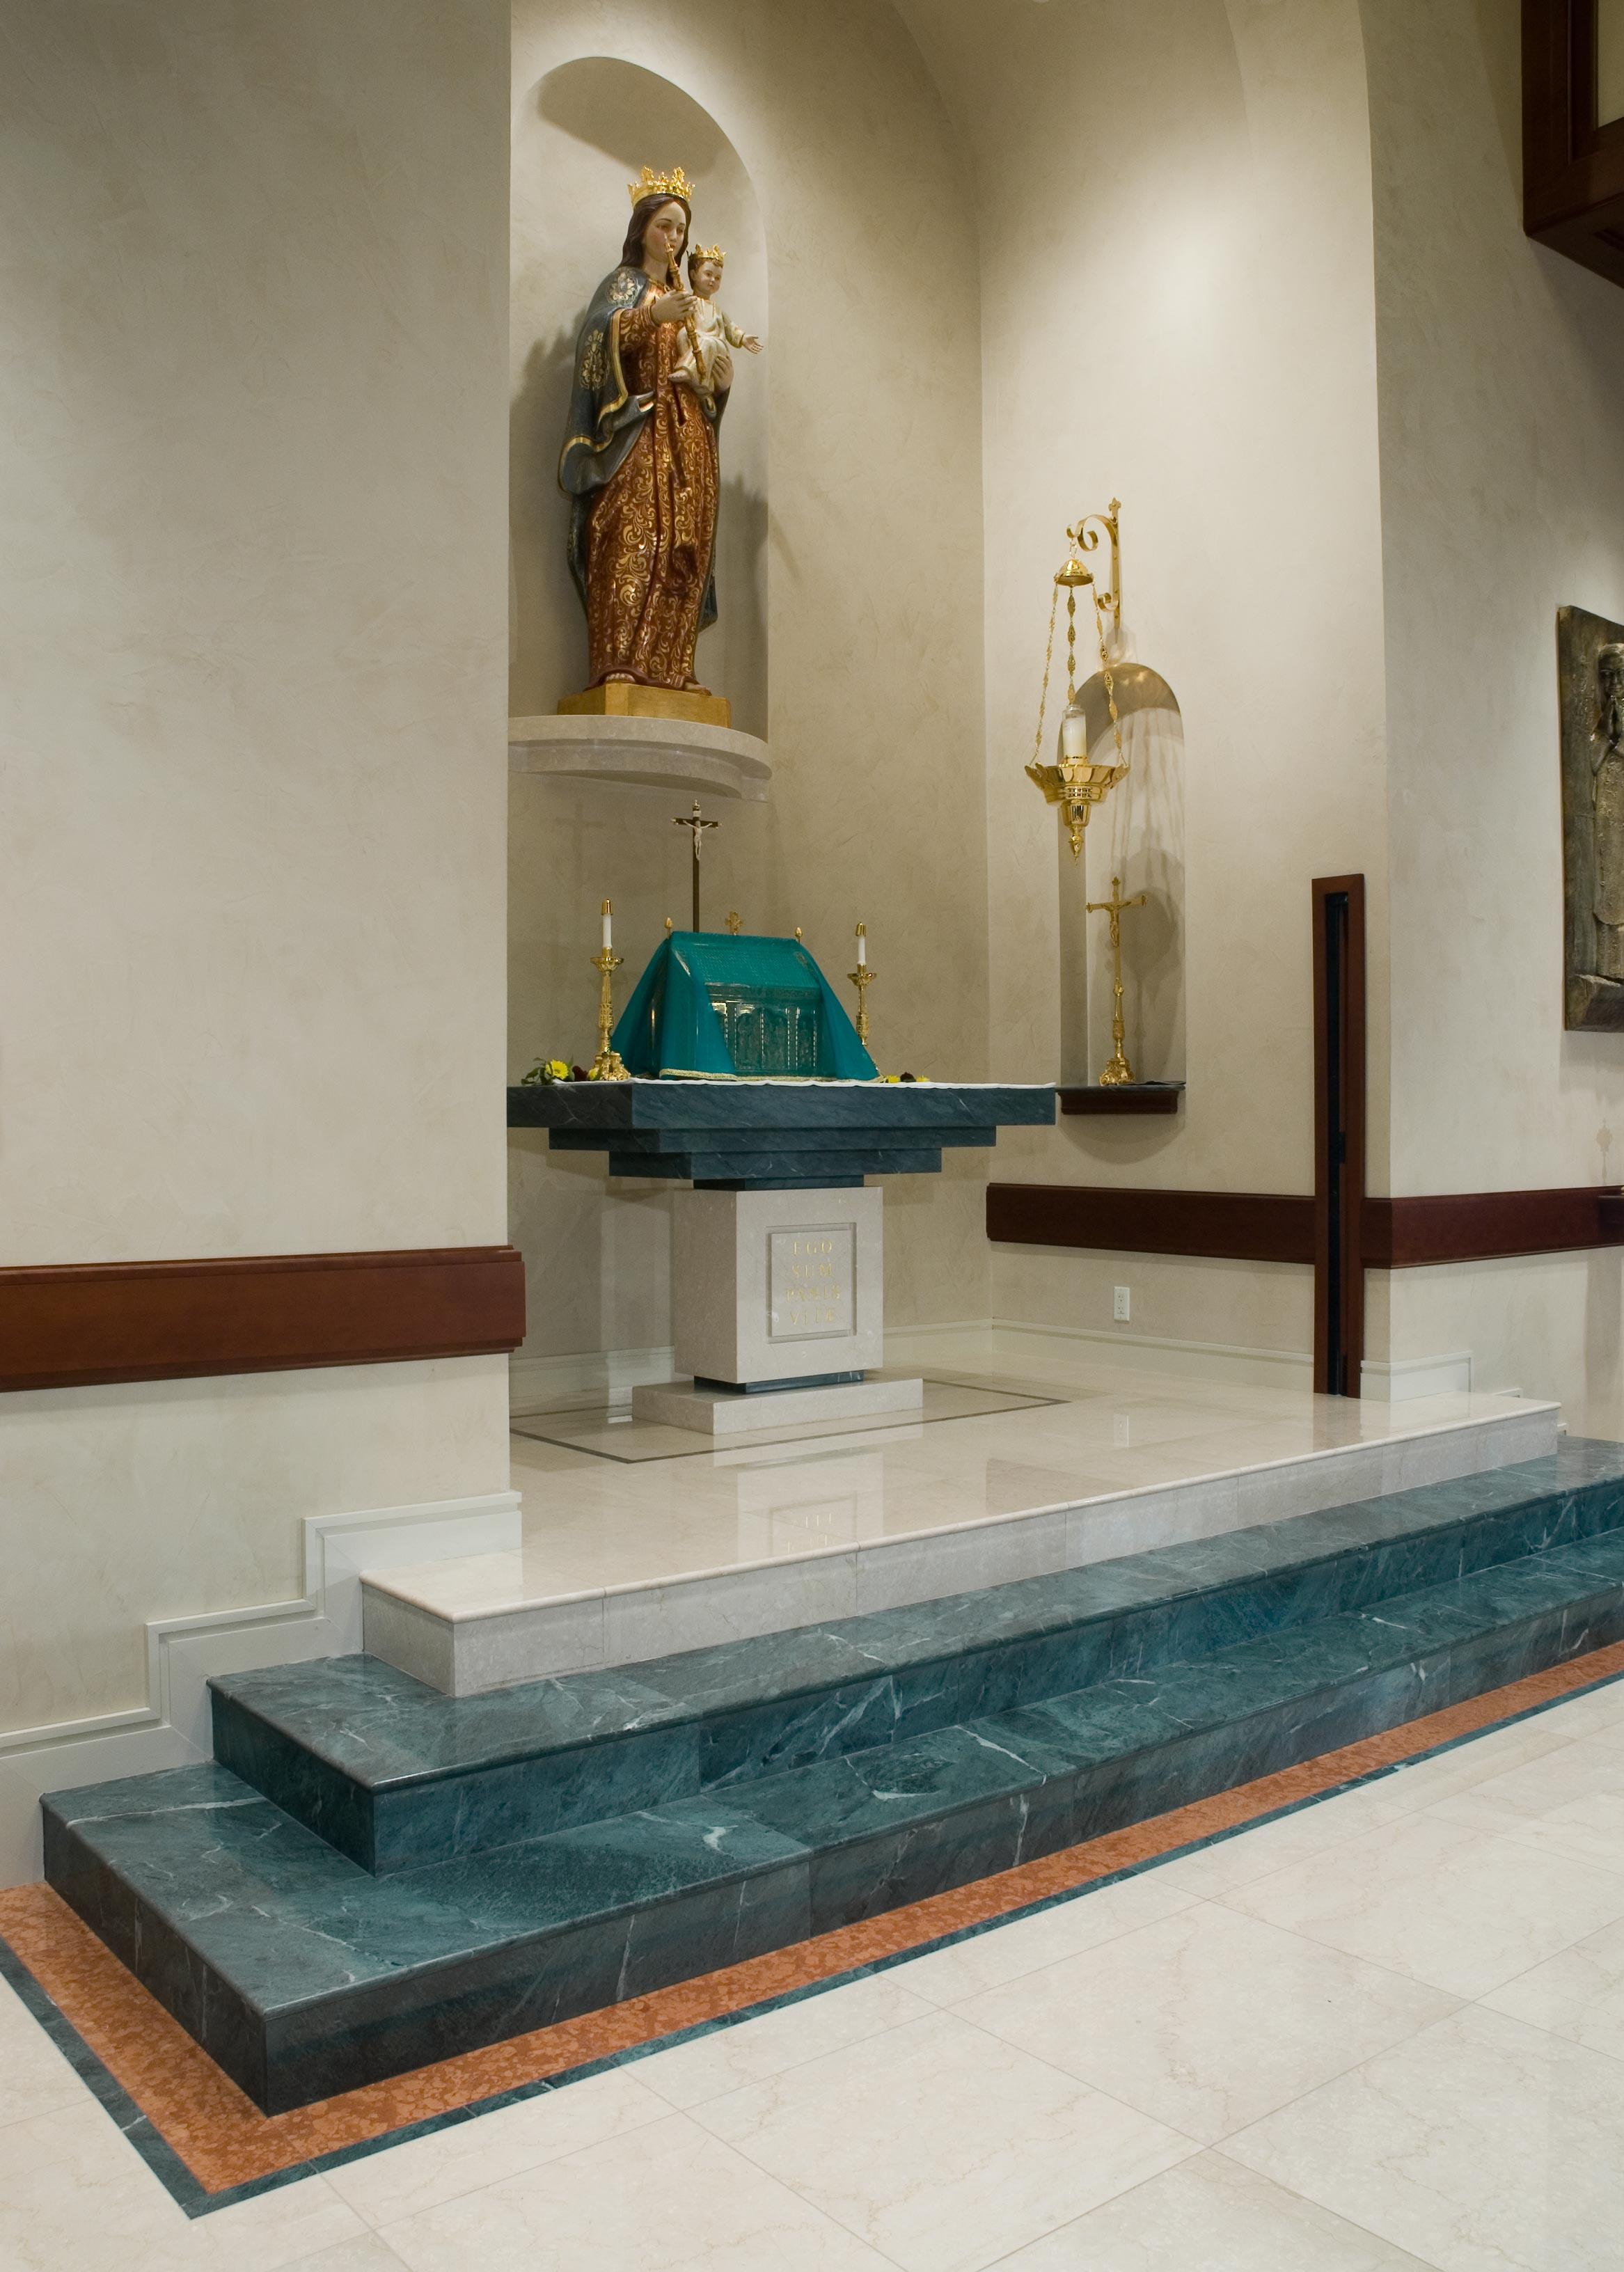 Reston-Study-Cntr-001-steps-and-rear-altar.jpg